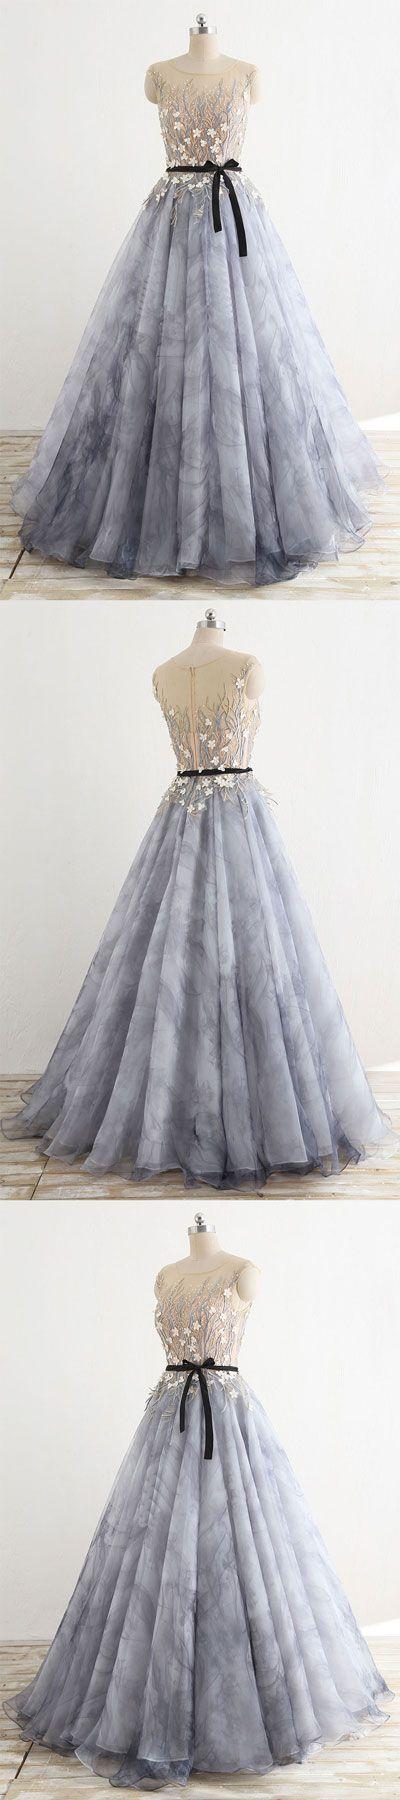 Gray round neck tulle long prom dress, gray evening dress | Kleider ...